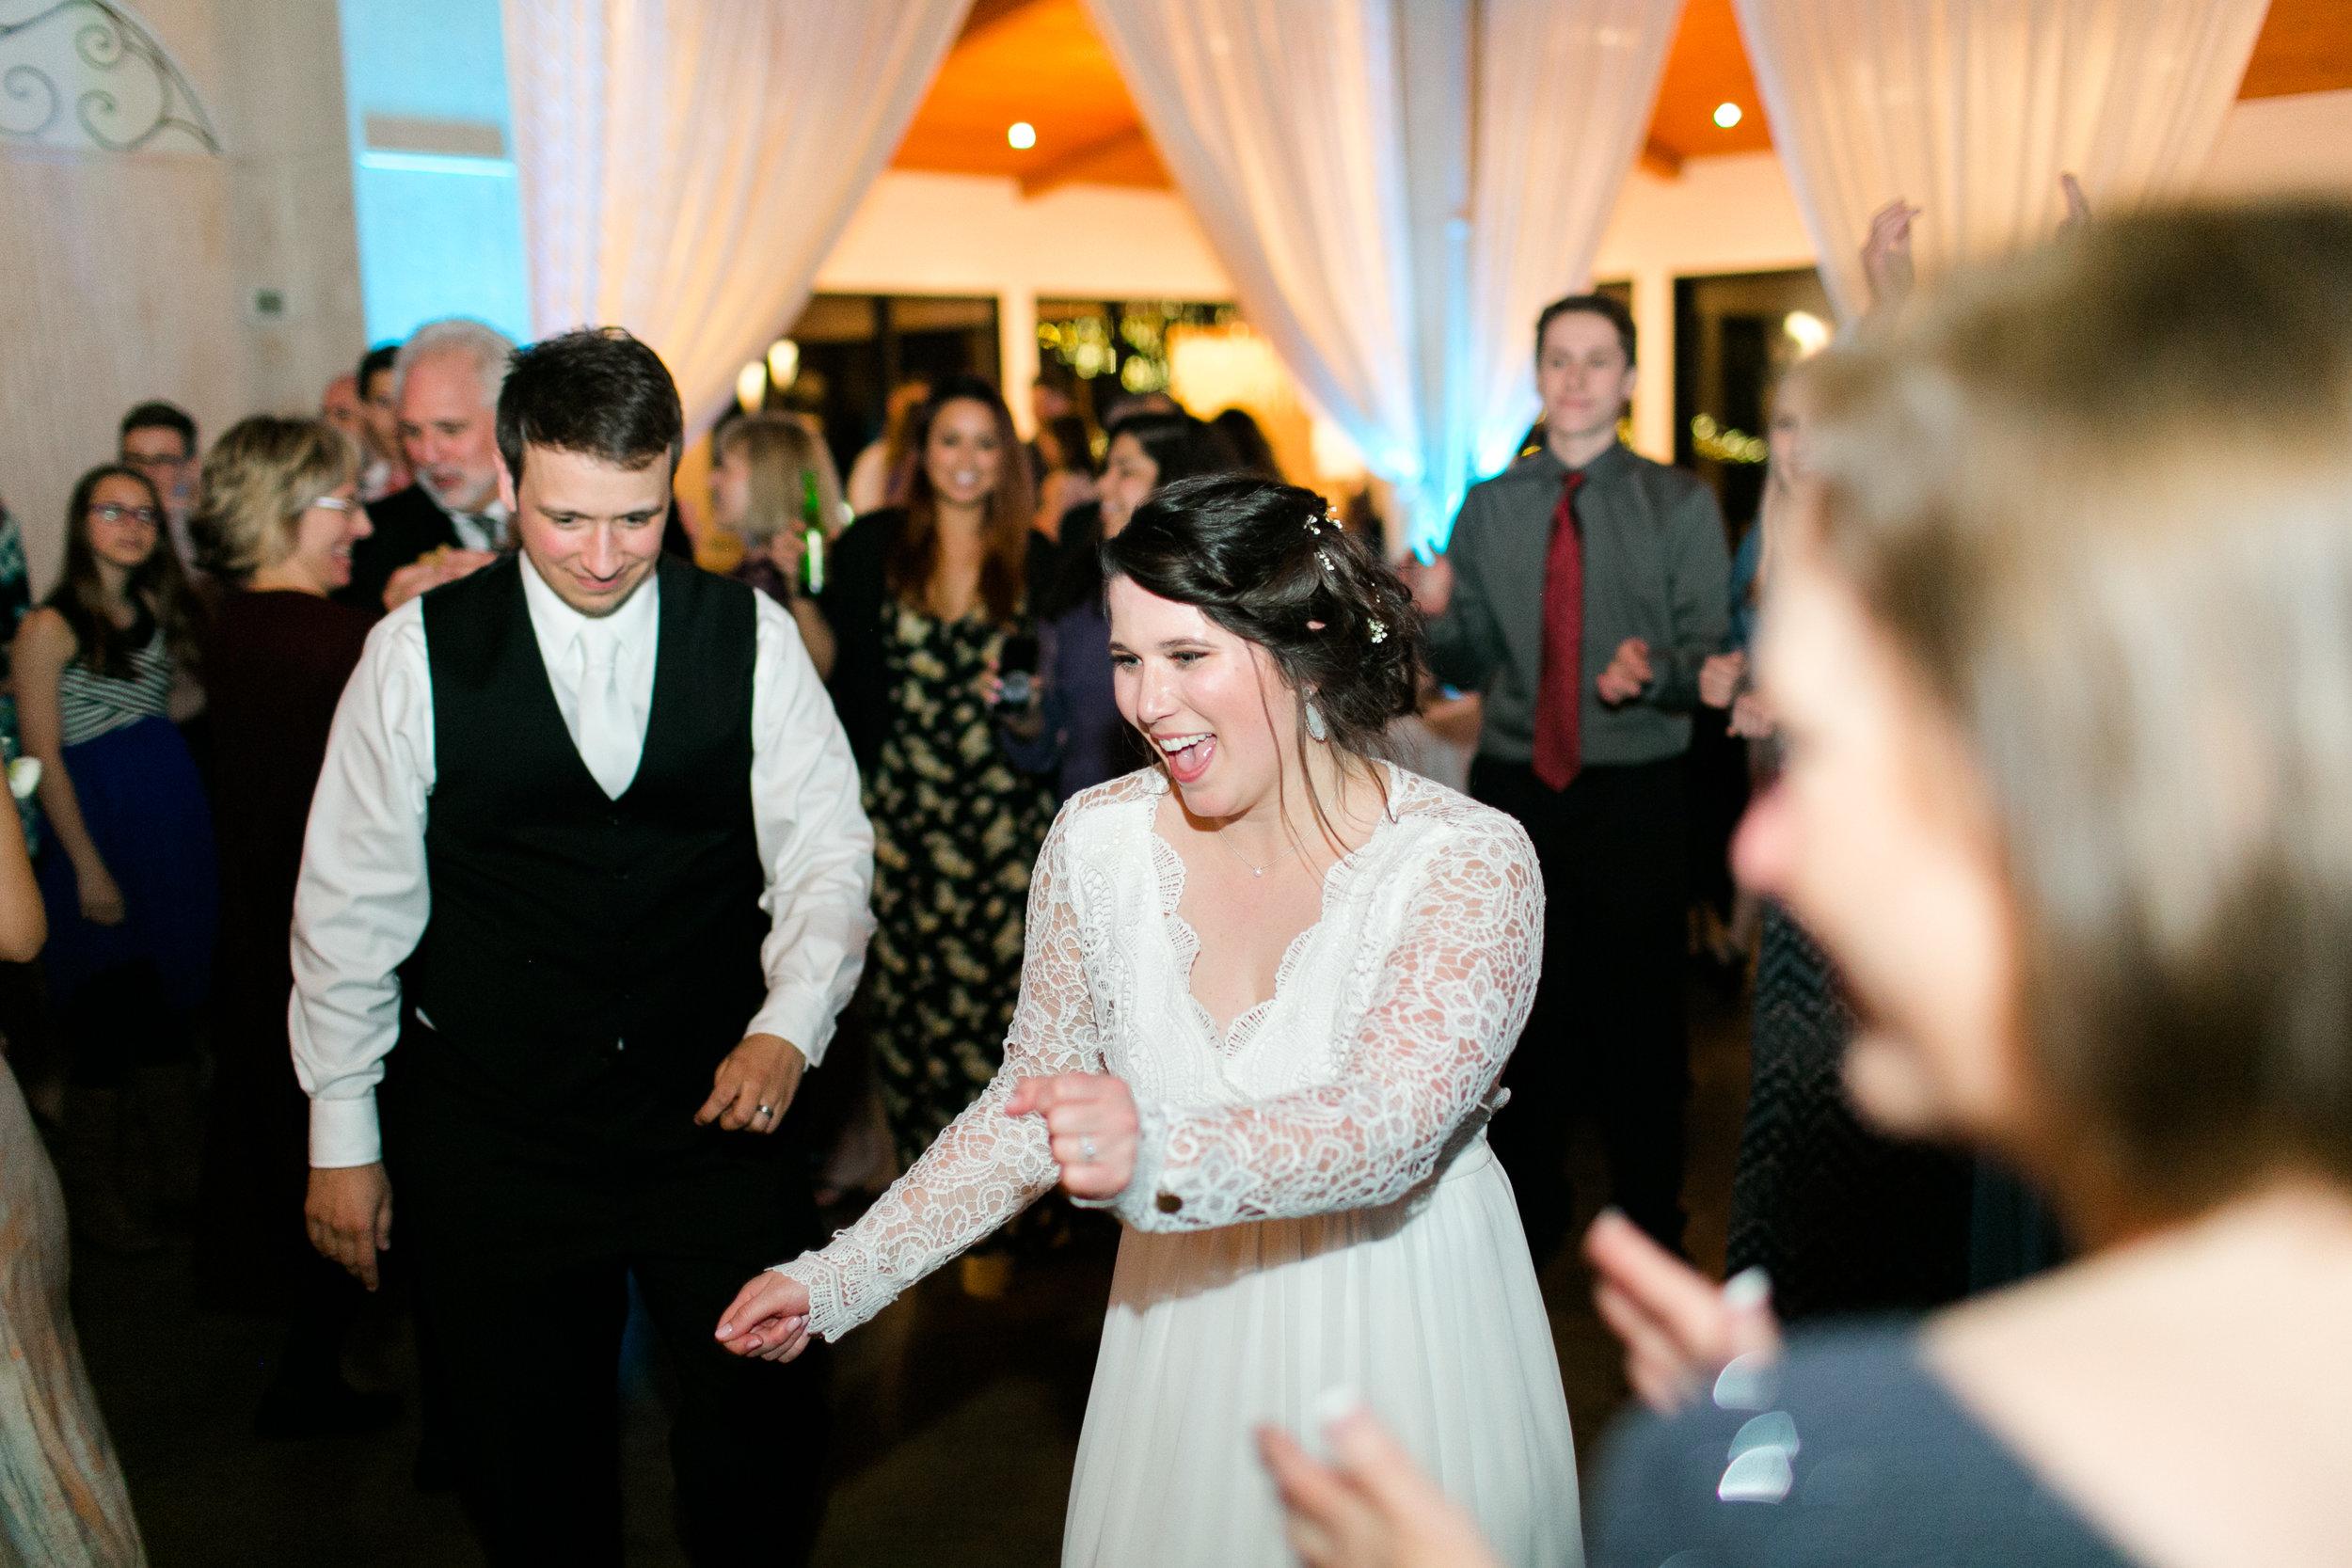 Austin_Texas_Fine_Art_Wedding_Photographer_Kayla_Snell_Photography_Antebellum_Oaks769.jpg